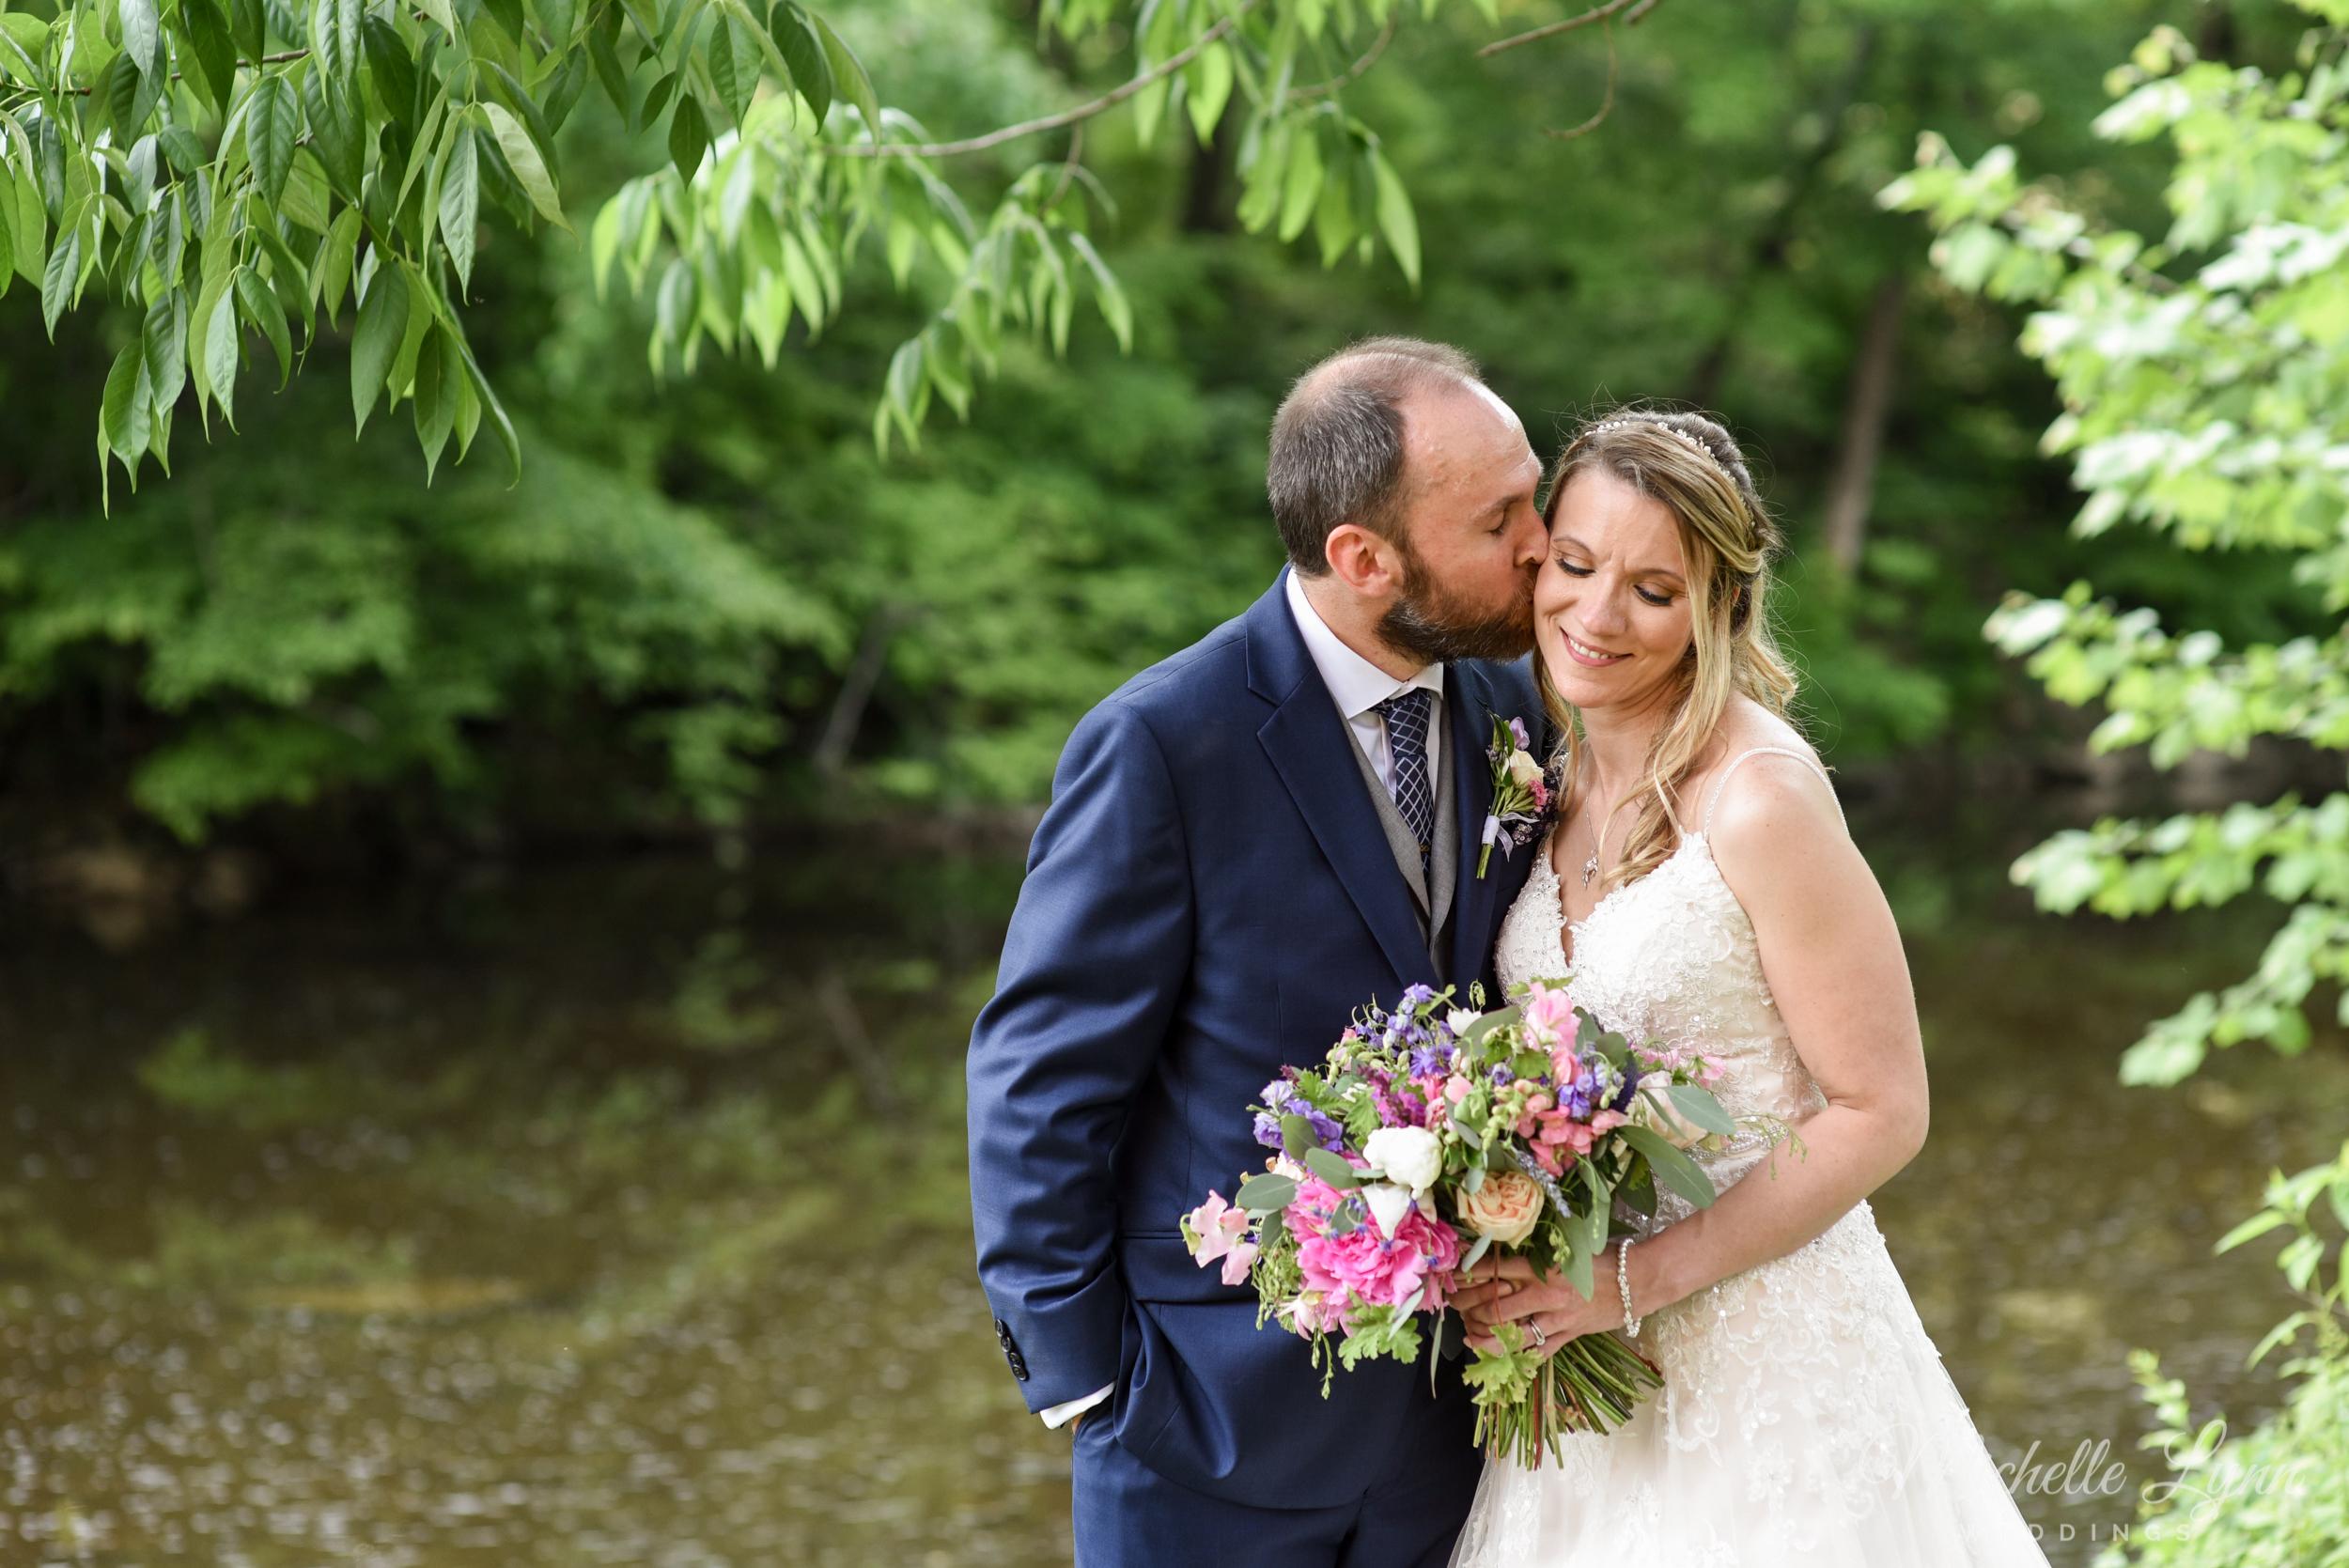 mlw-prallsville-mills-nj-wedding-photographer-52.jpg